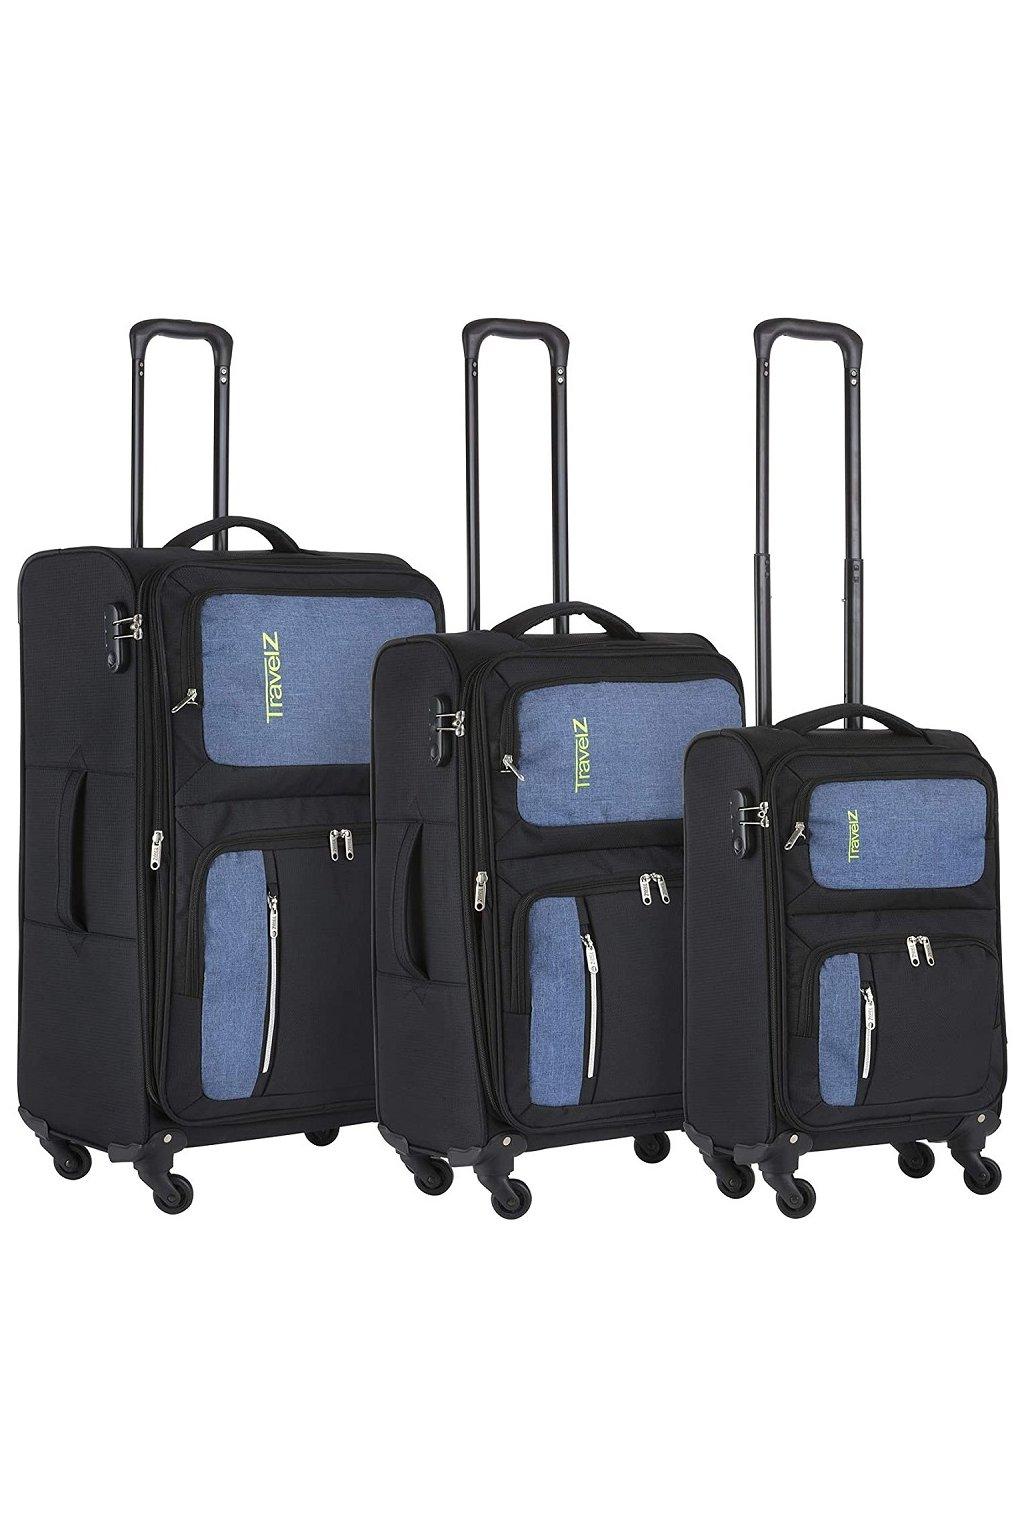 kufrland travelz tripplepocket (2)